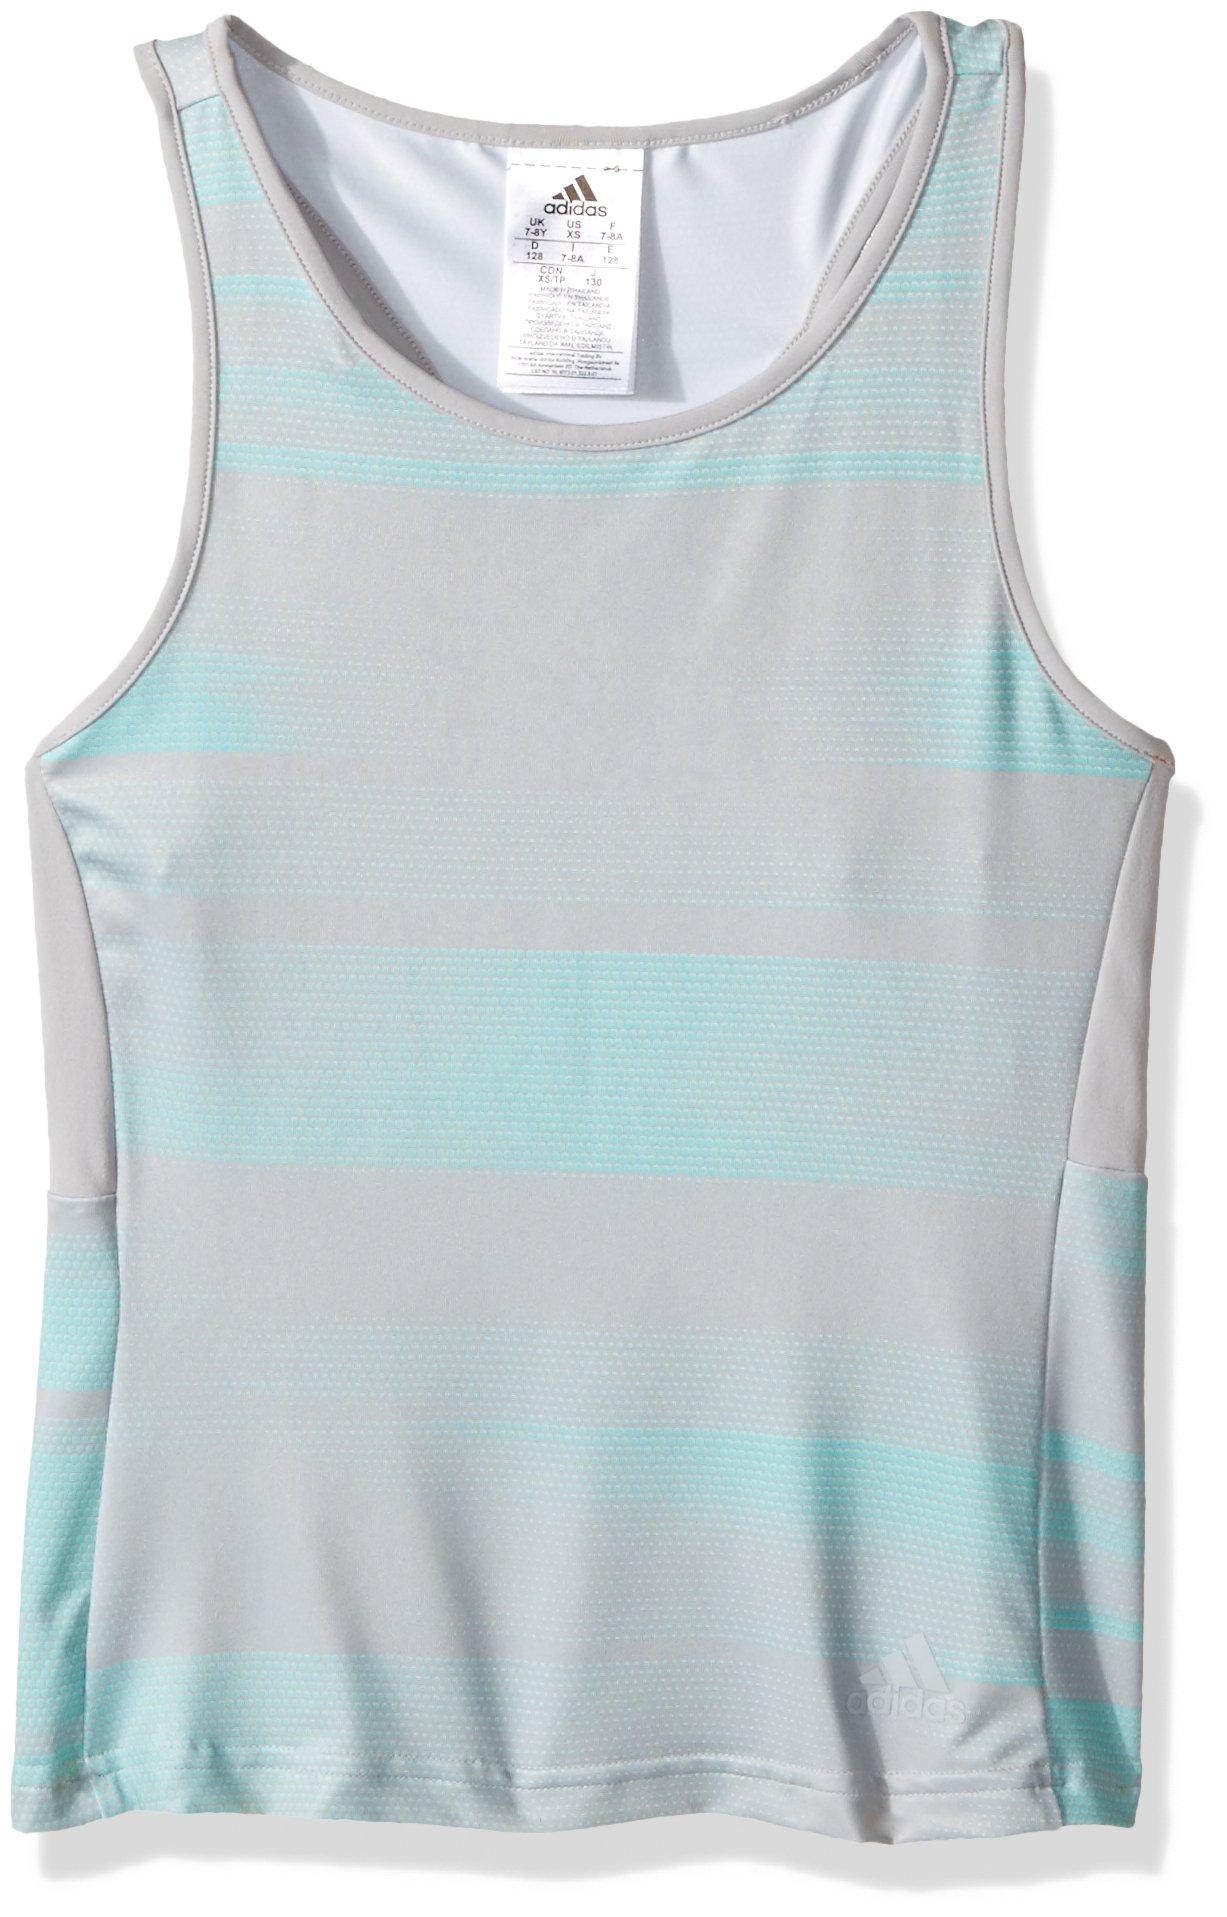 adidas Girls Tennis Advantage Tank Top, Grey Two, X-Small